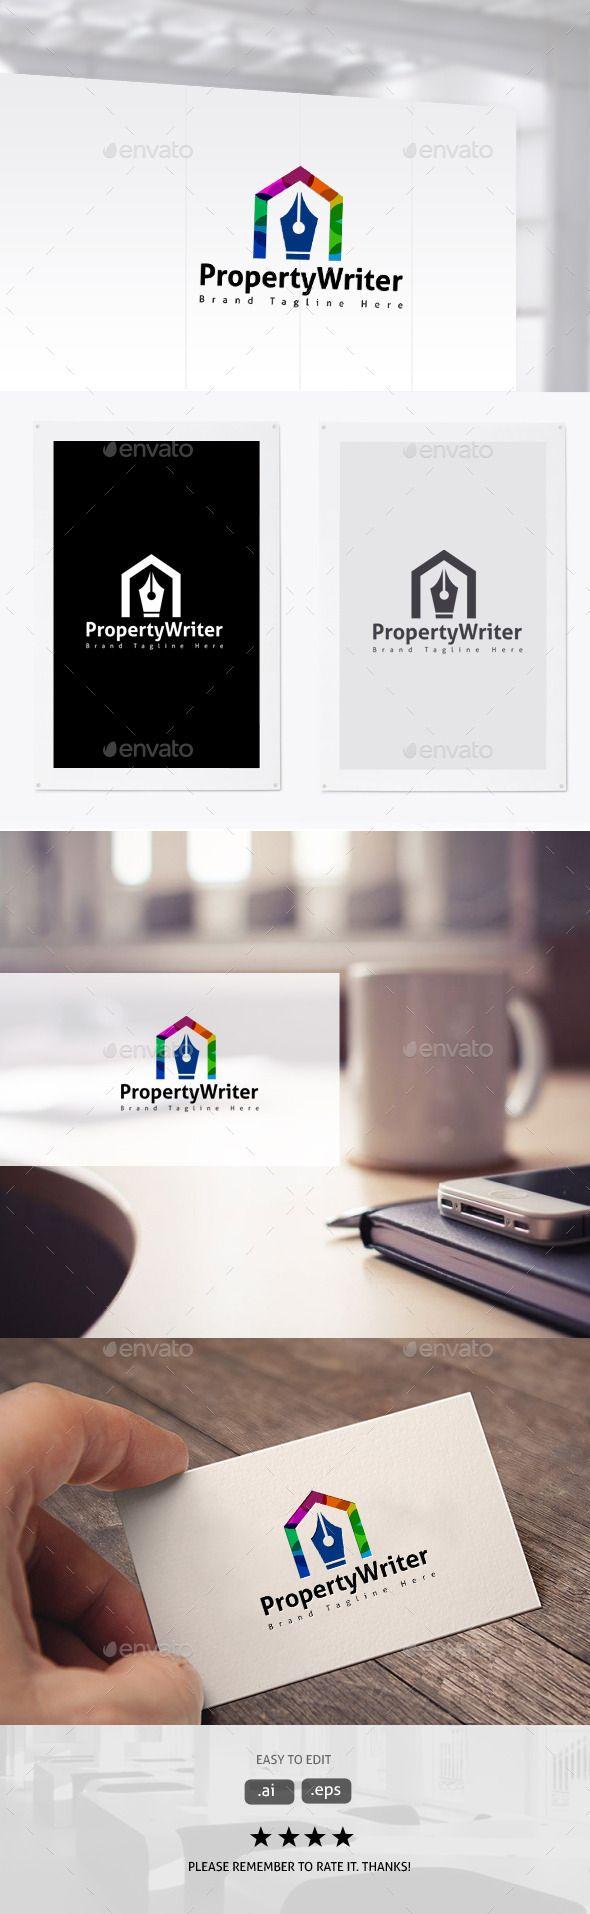 Property Writer u2014 Vector EPS company real